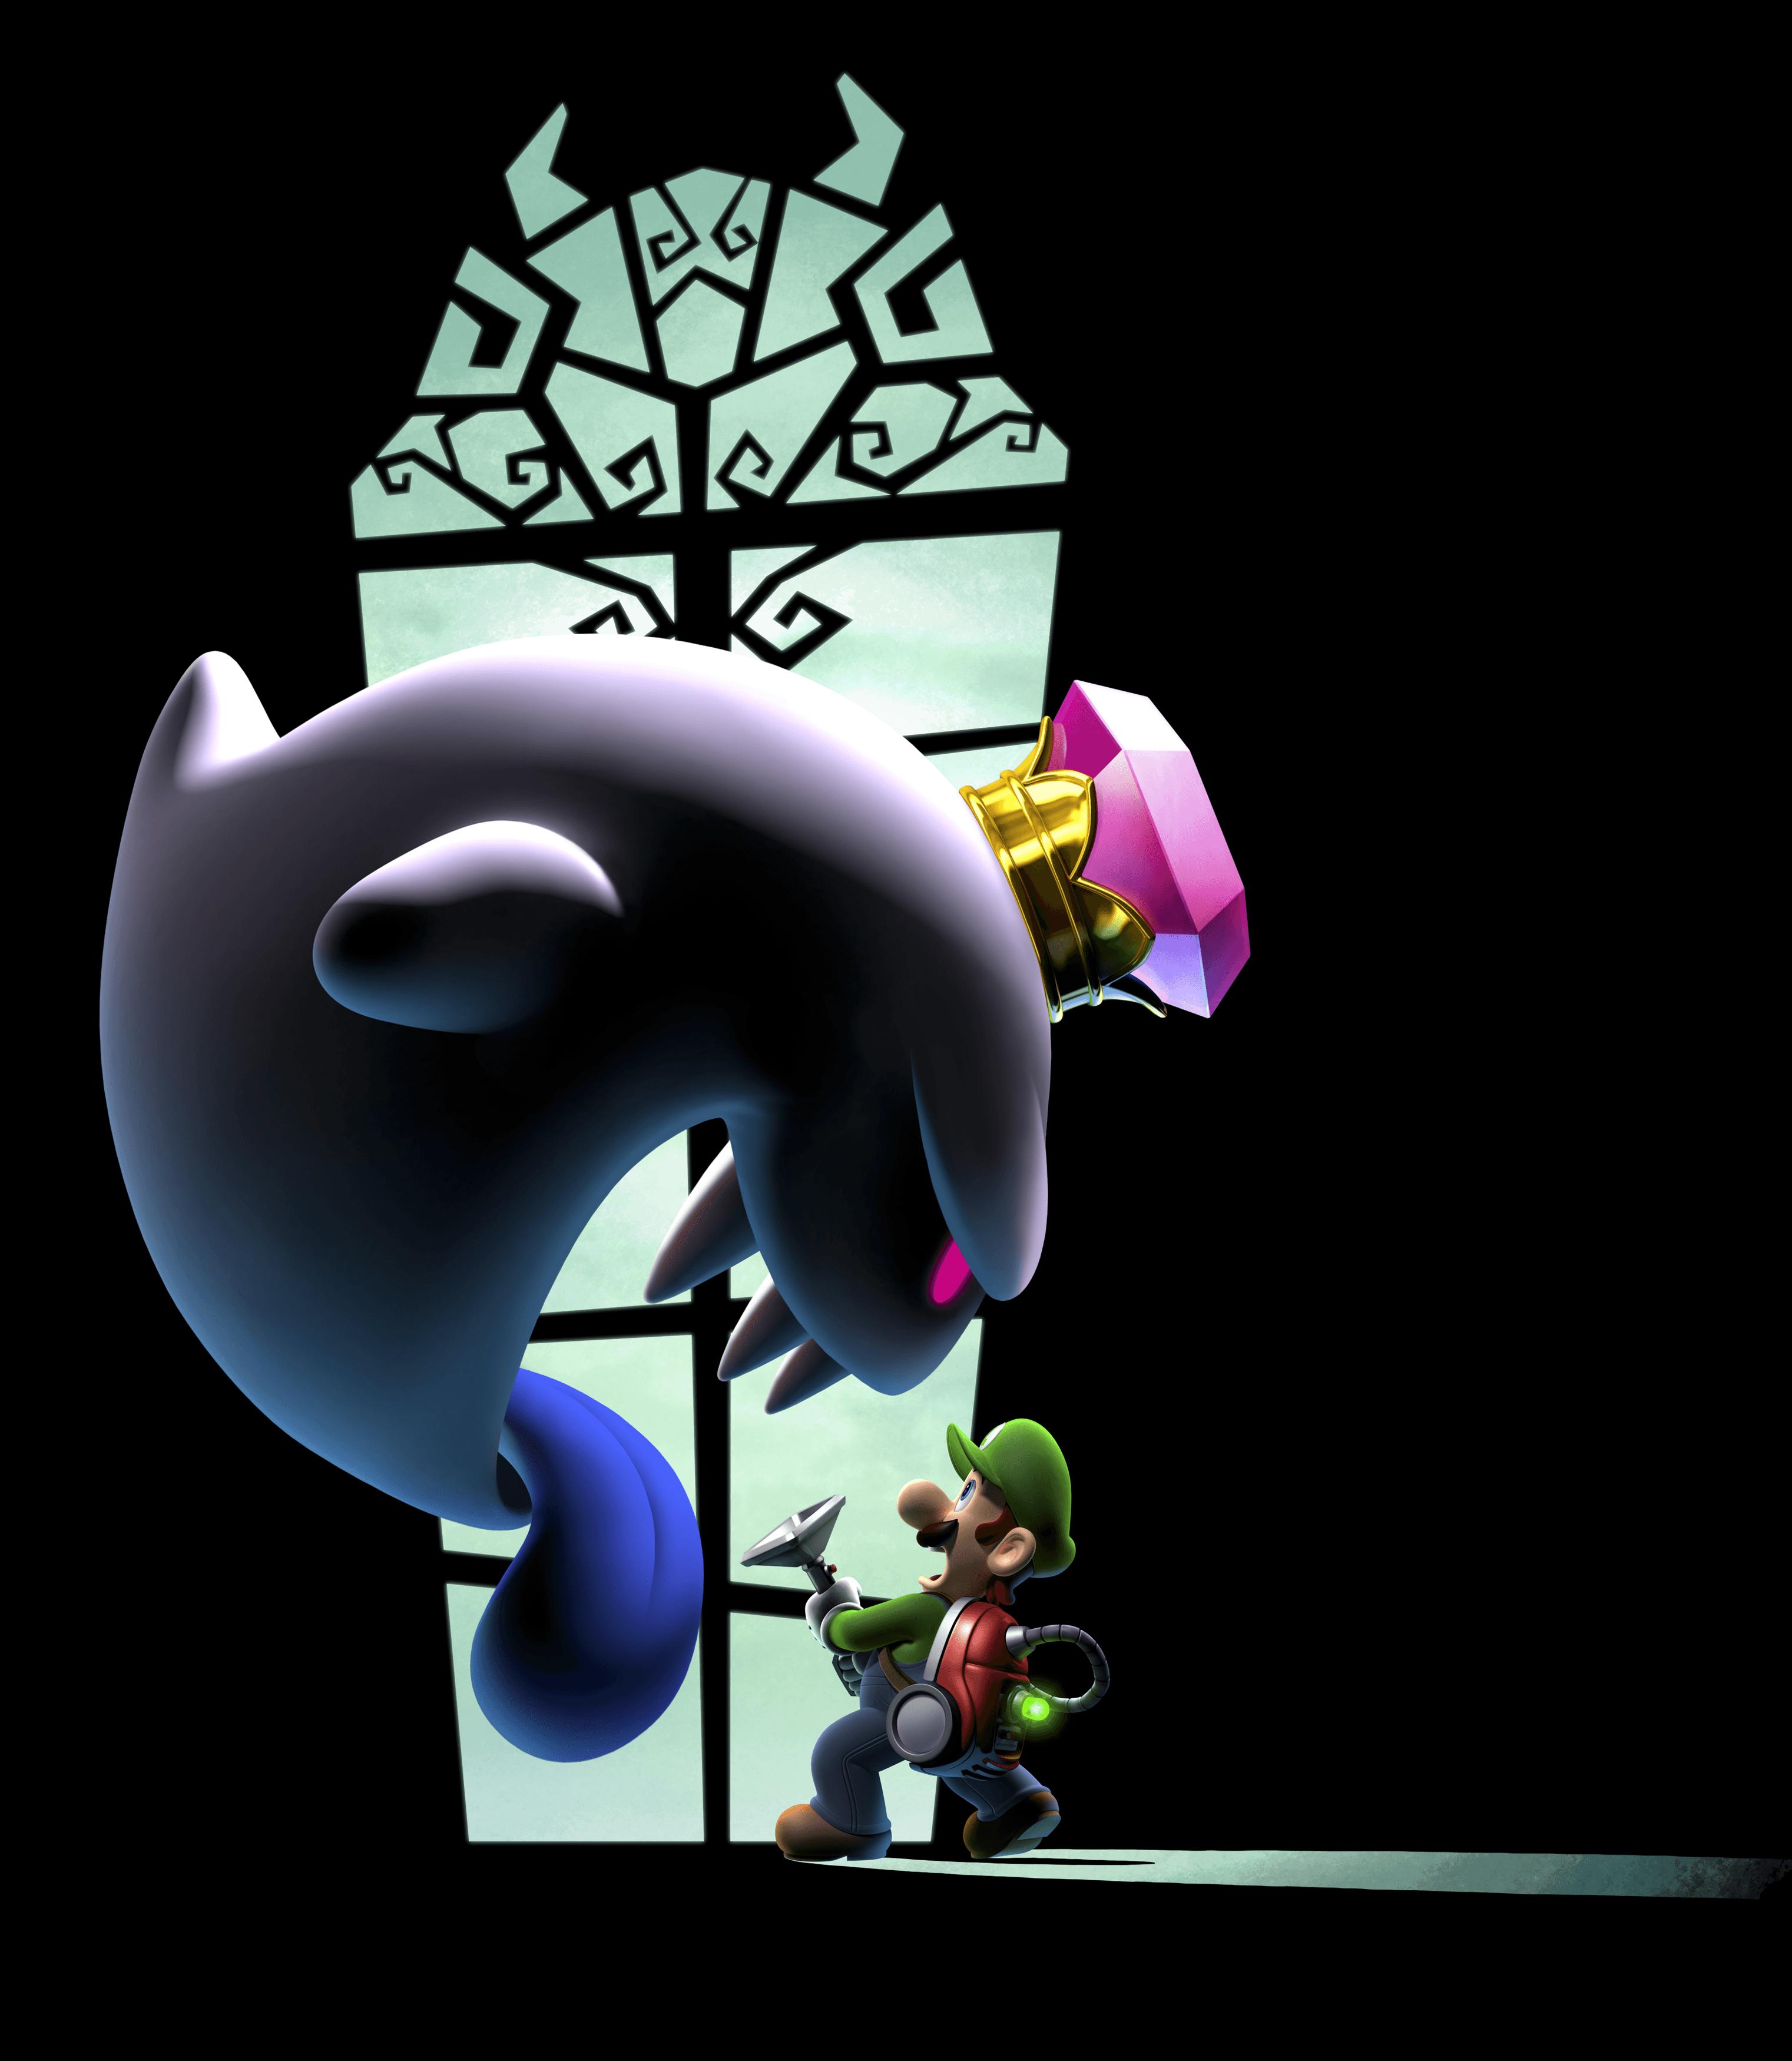 Luigi S Mansion 2 Dark Moon Nintendo 3ds Character Ghost